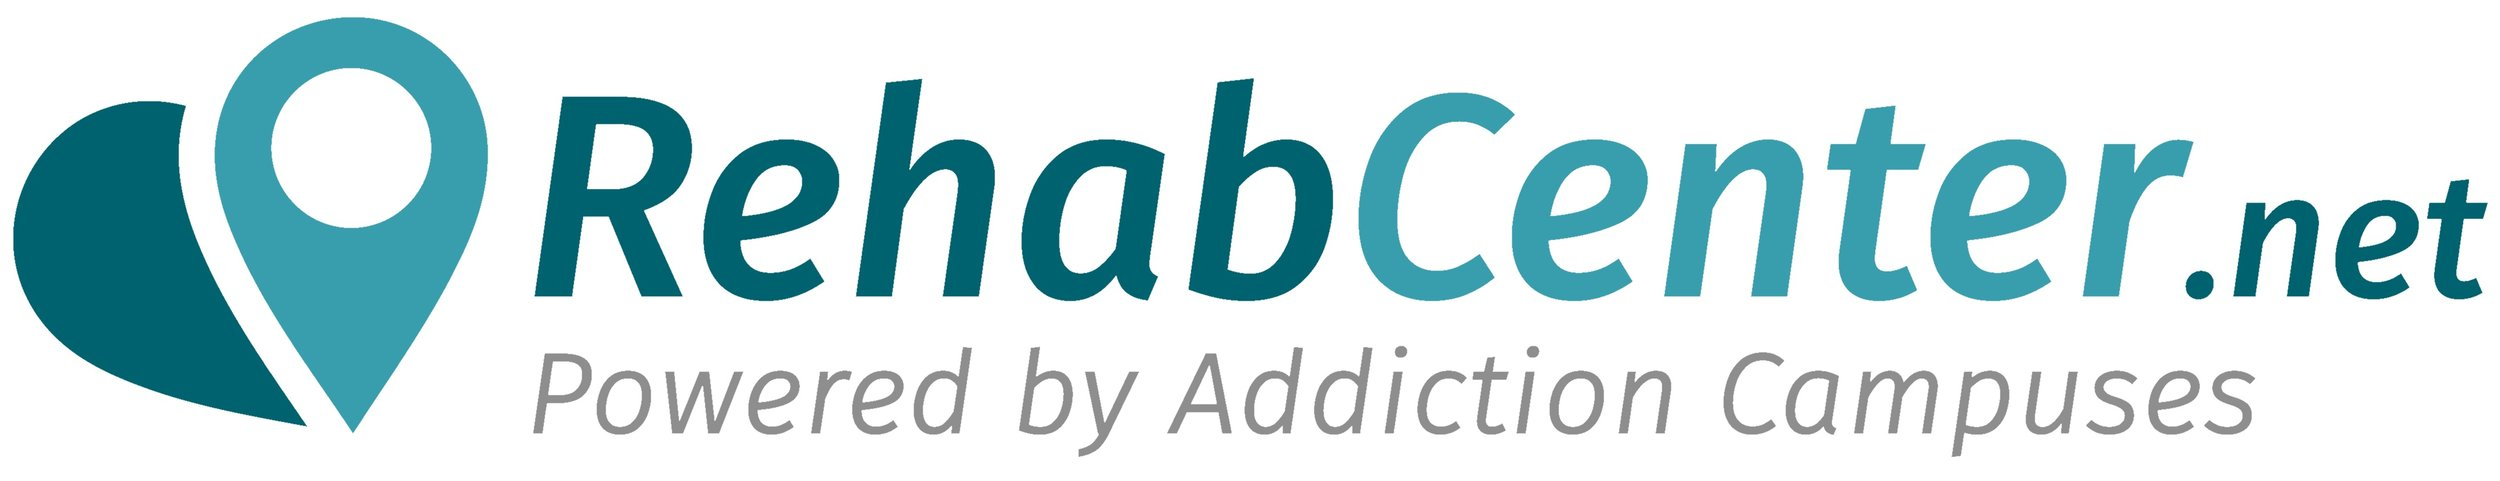 rehabcenter-main-logo.jpg